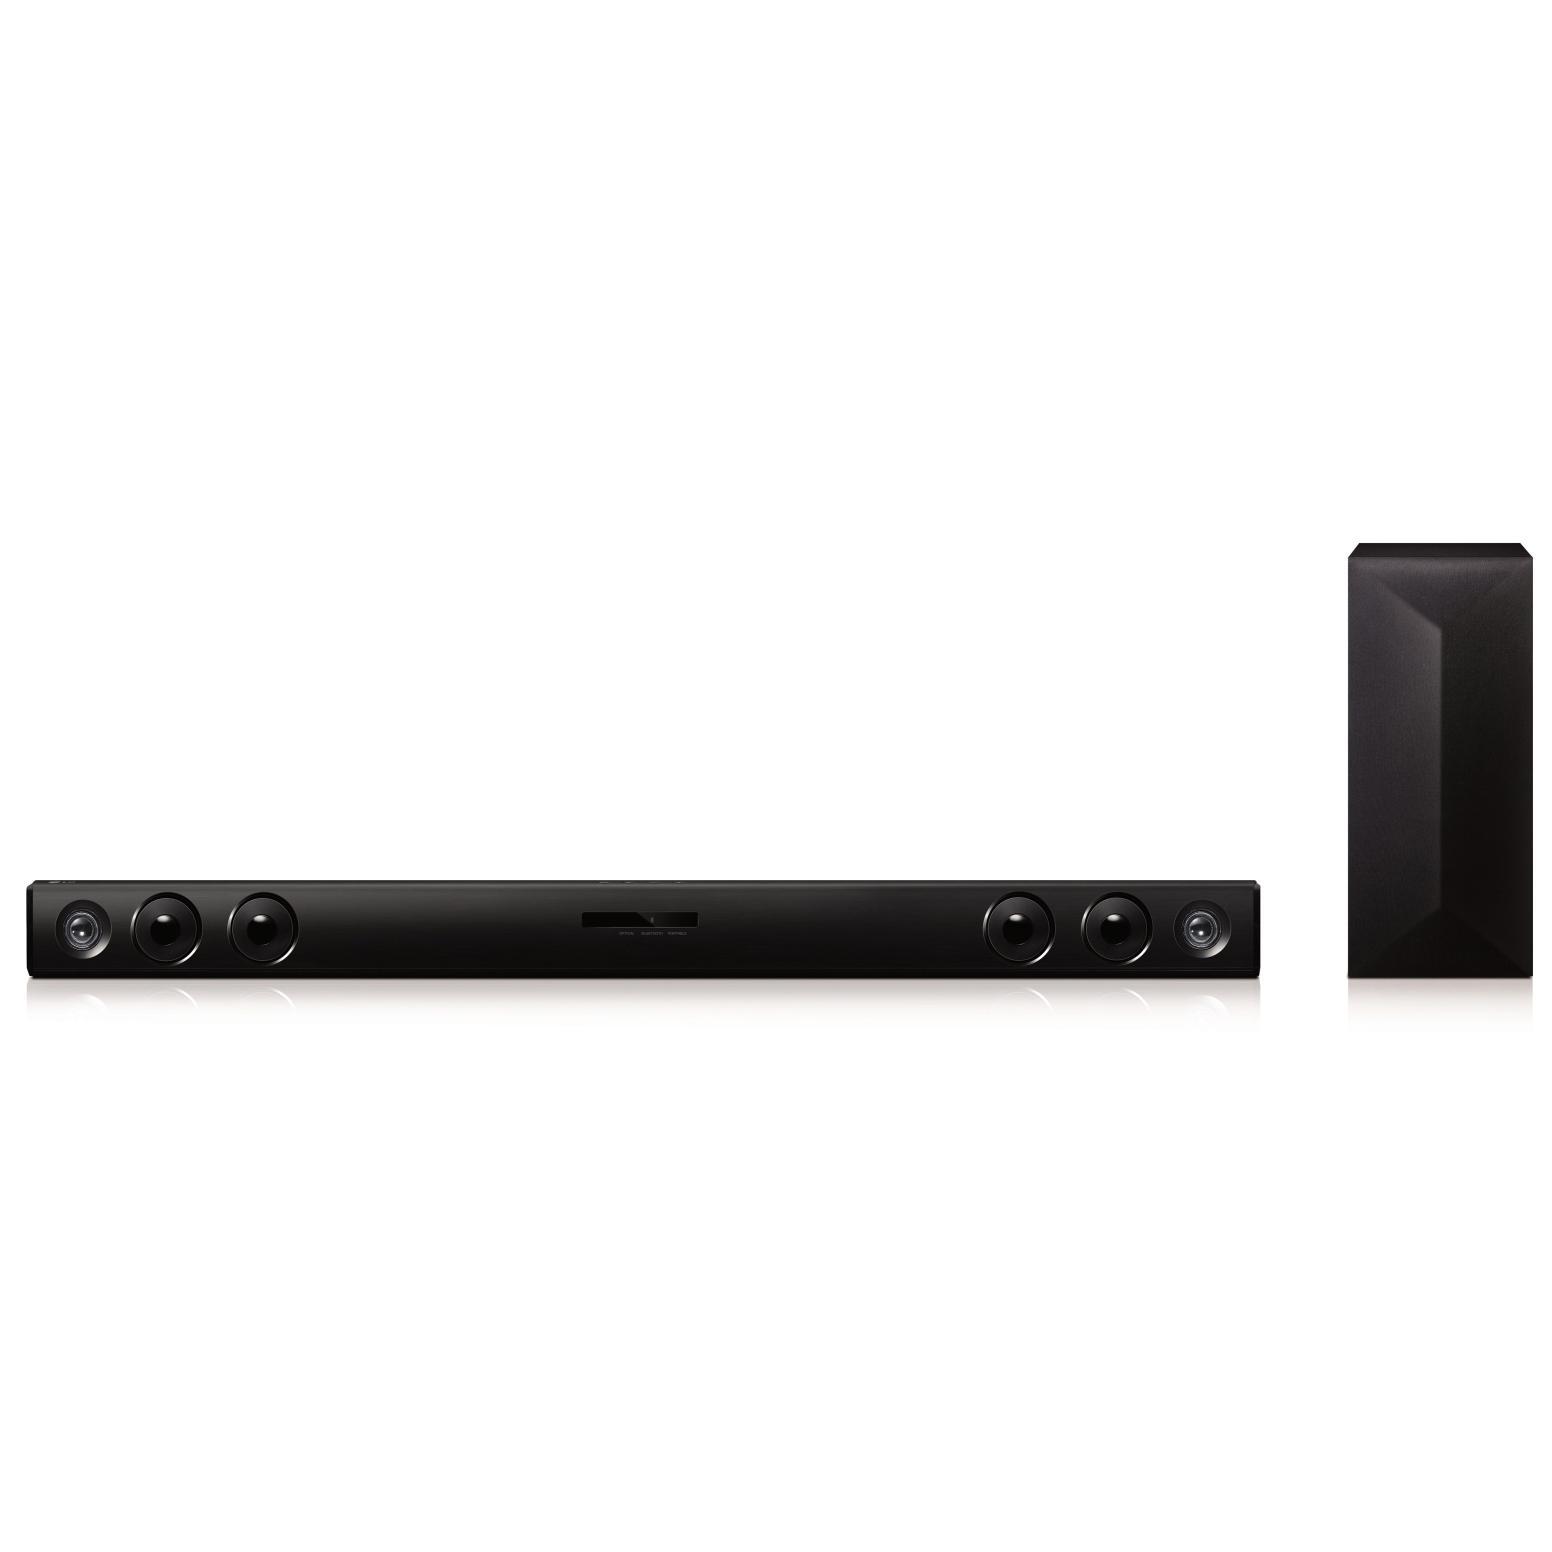 LG LAS464B - 2.1 CH Sound Bar with Subwoofer - Black